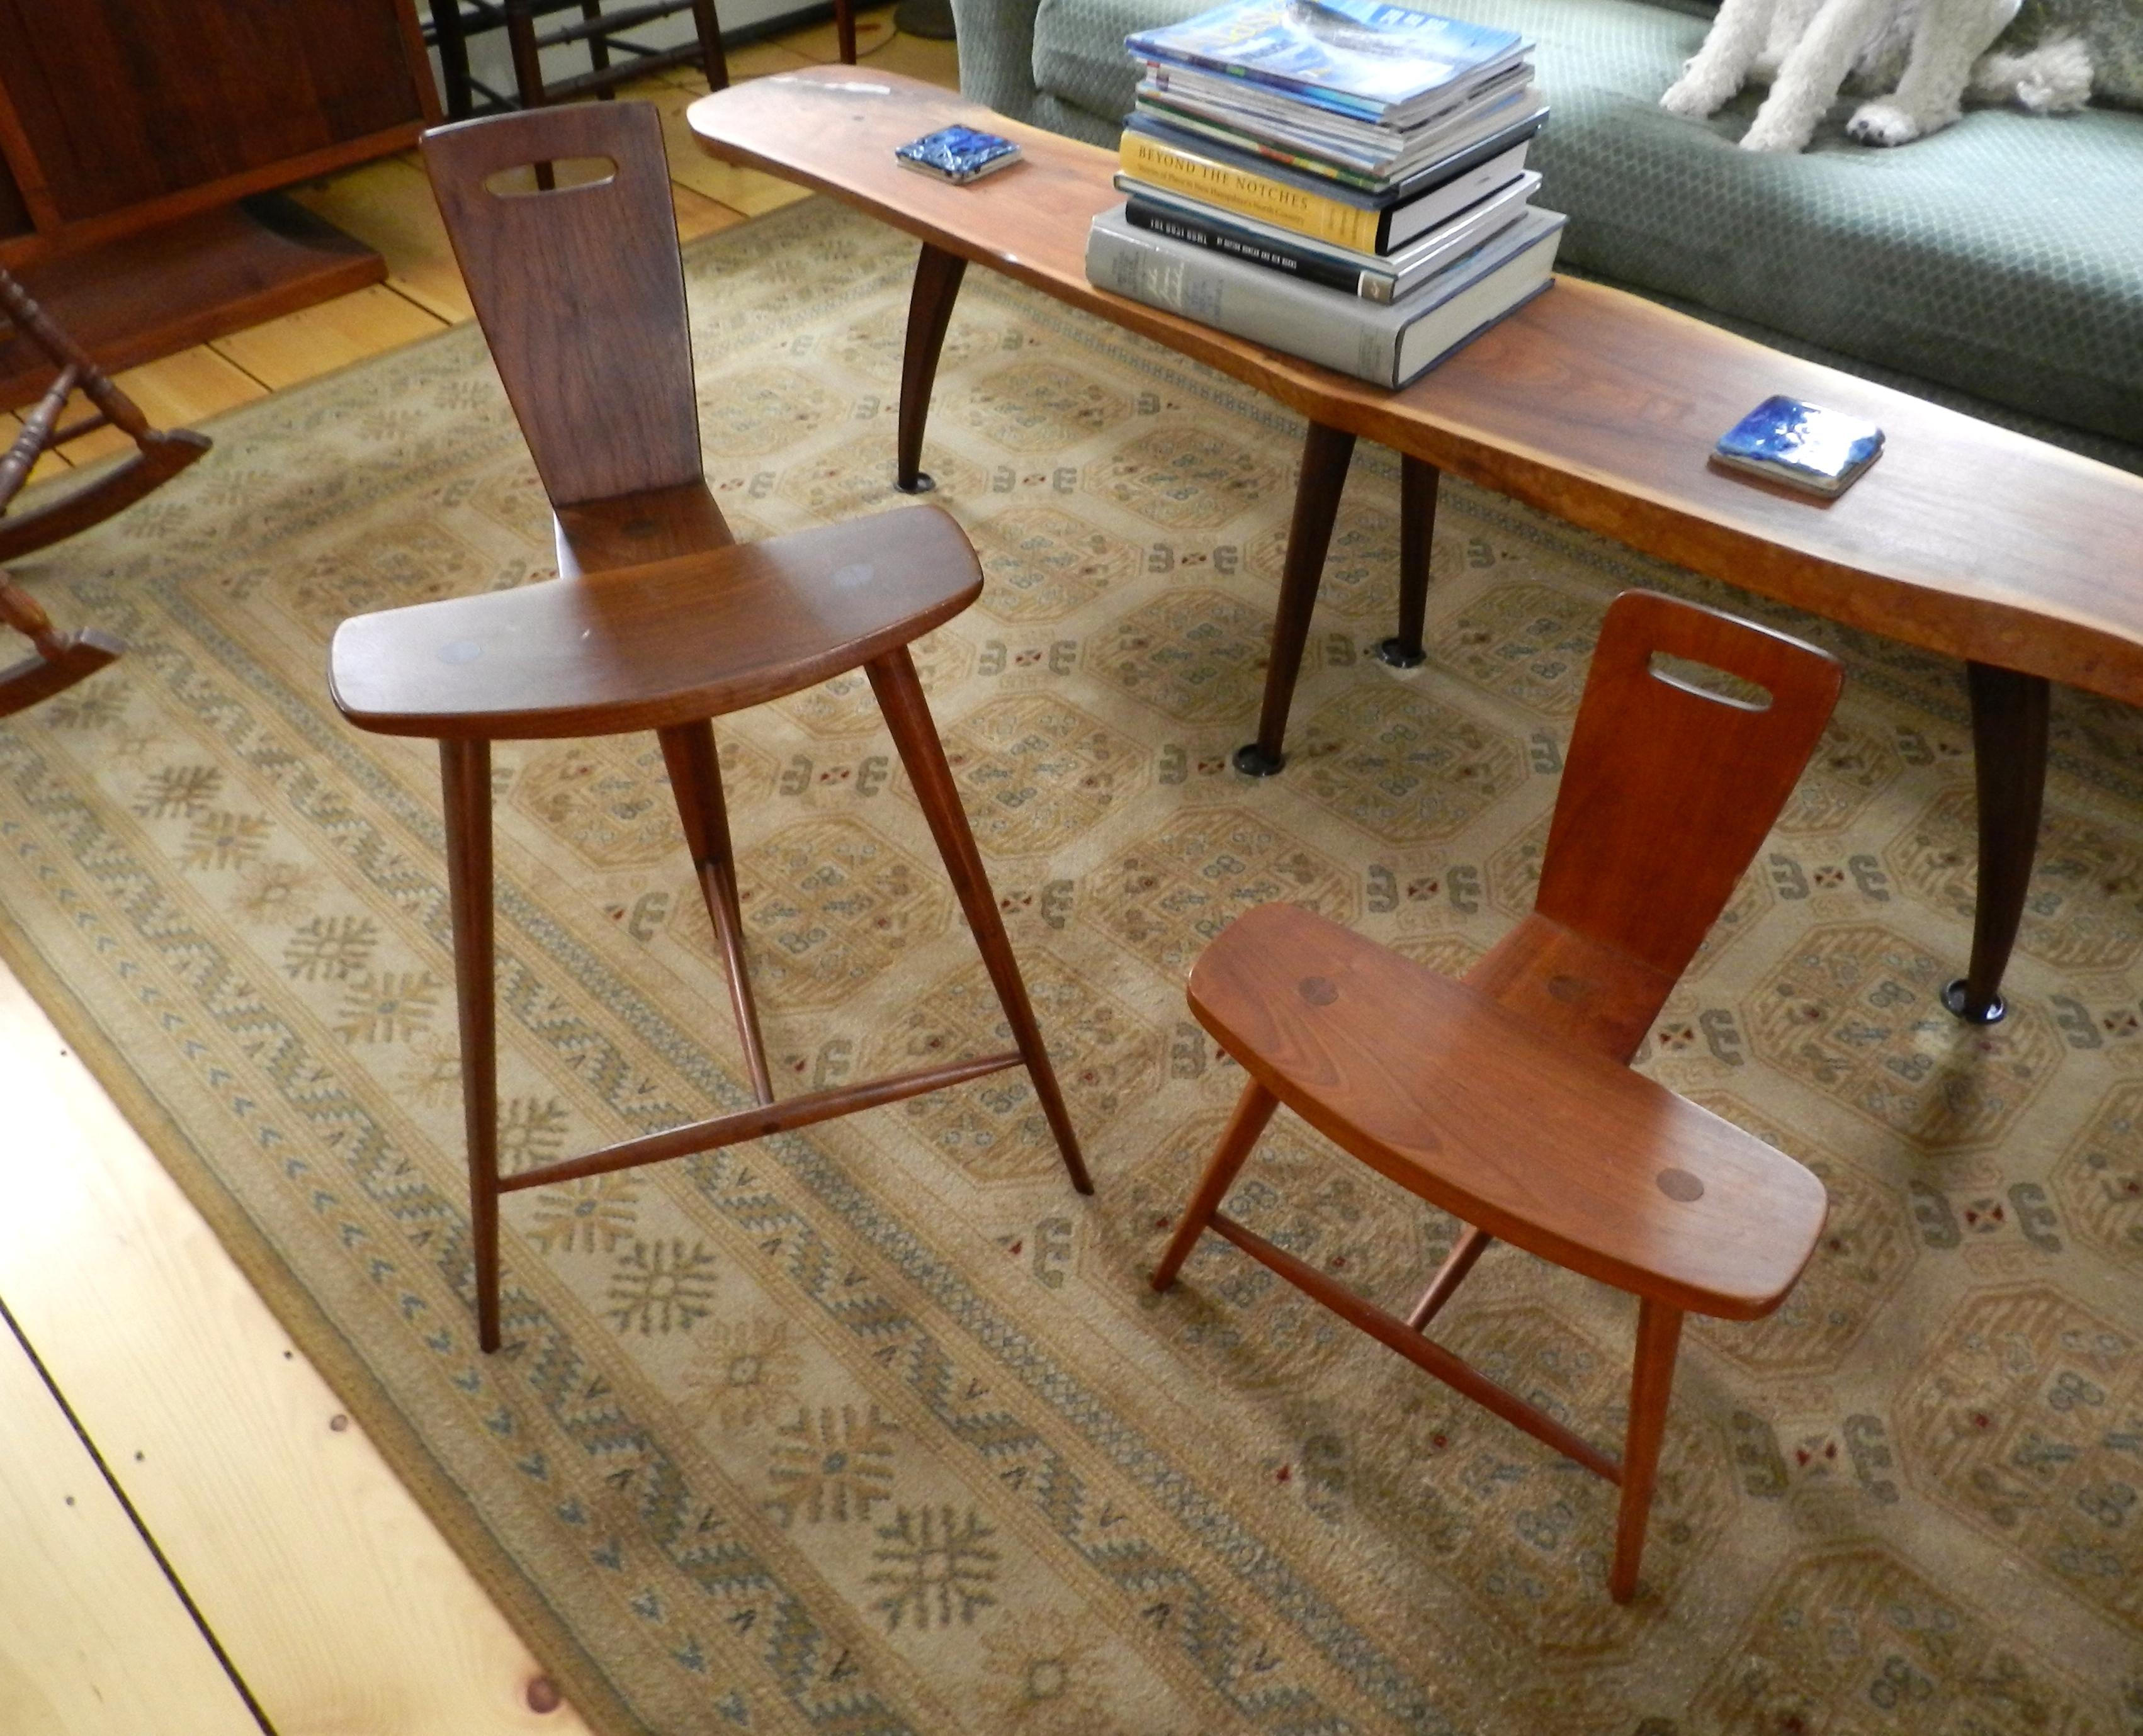 Stupendous 3 Legged Stool Rainford Restorations Beatyapartments Chair Design Images Beatyapartmentscom